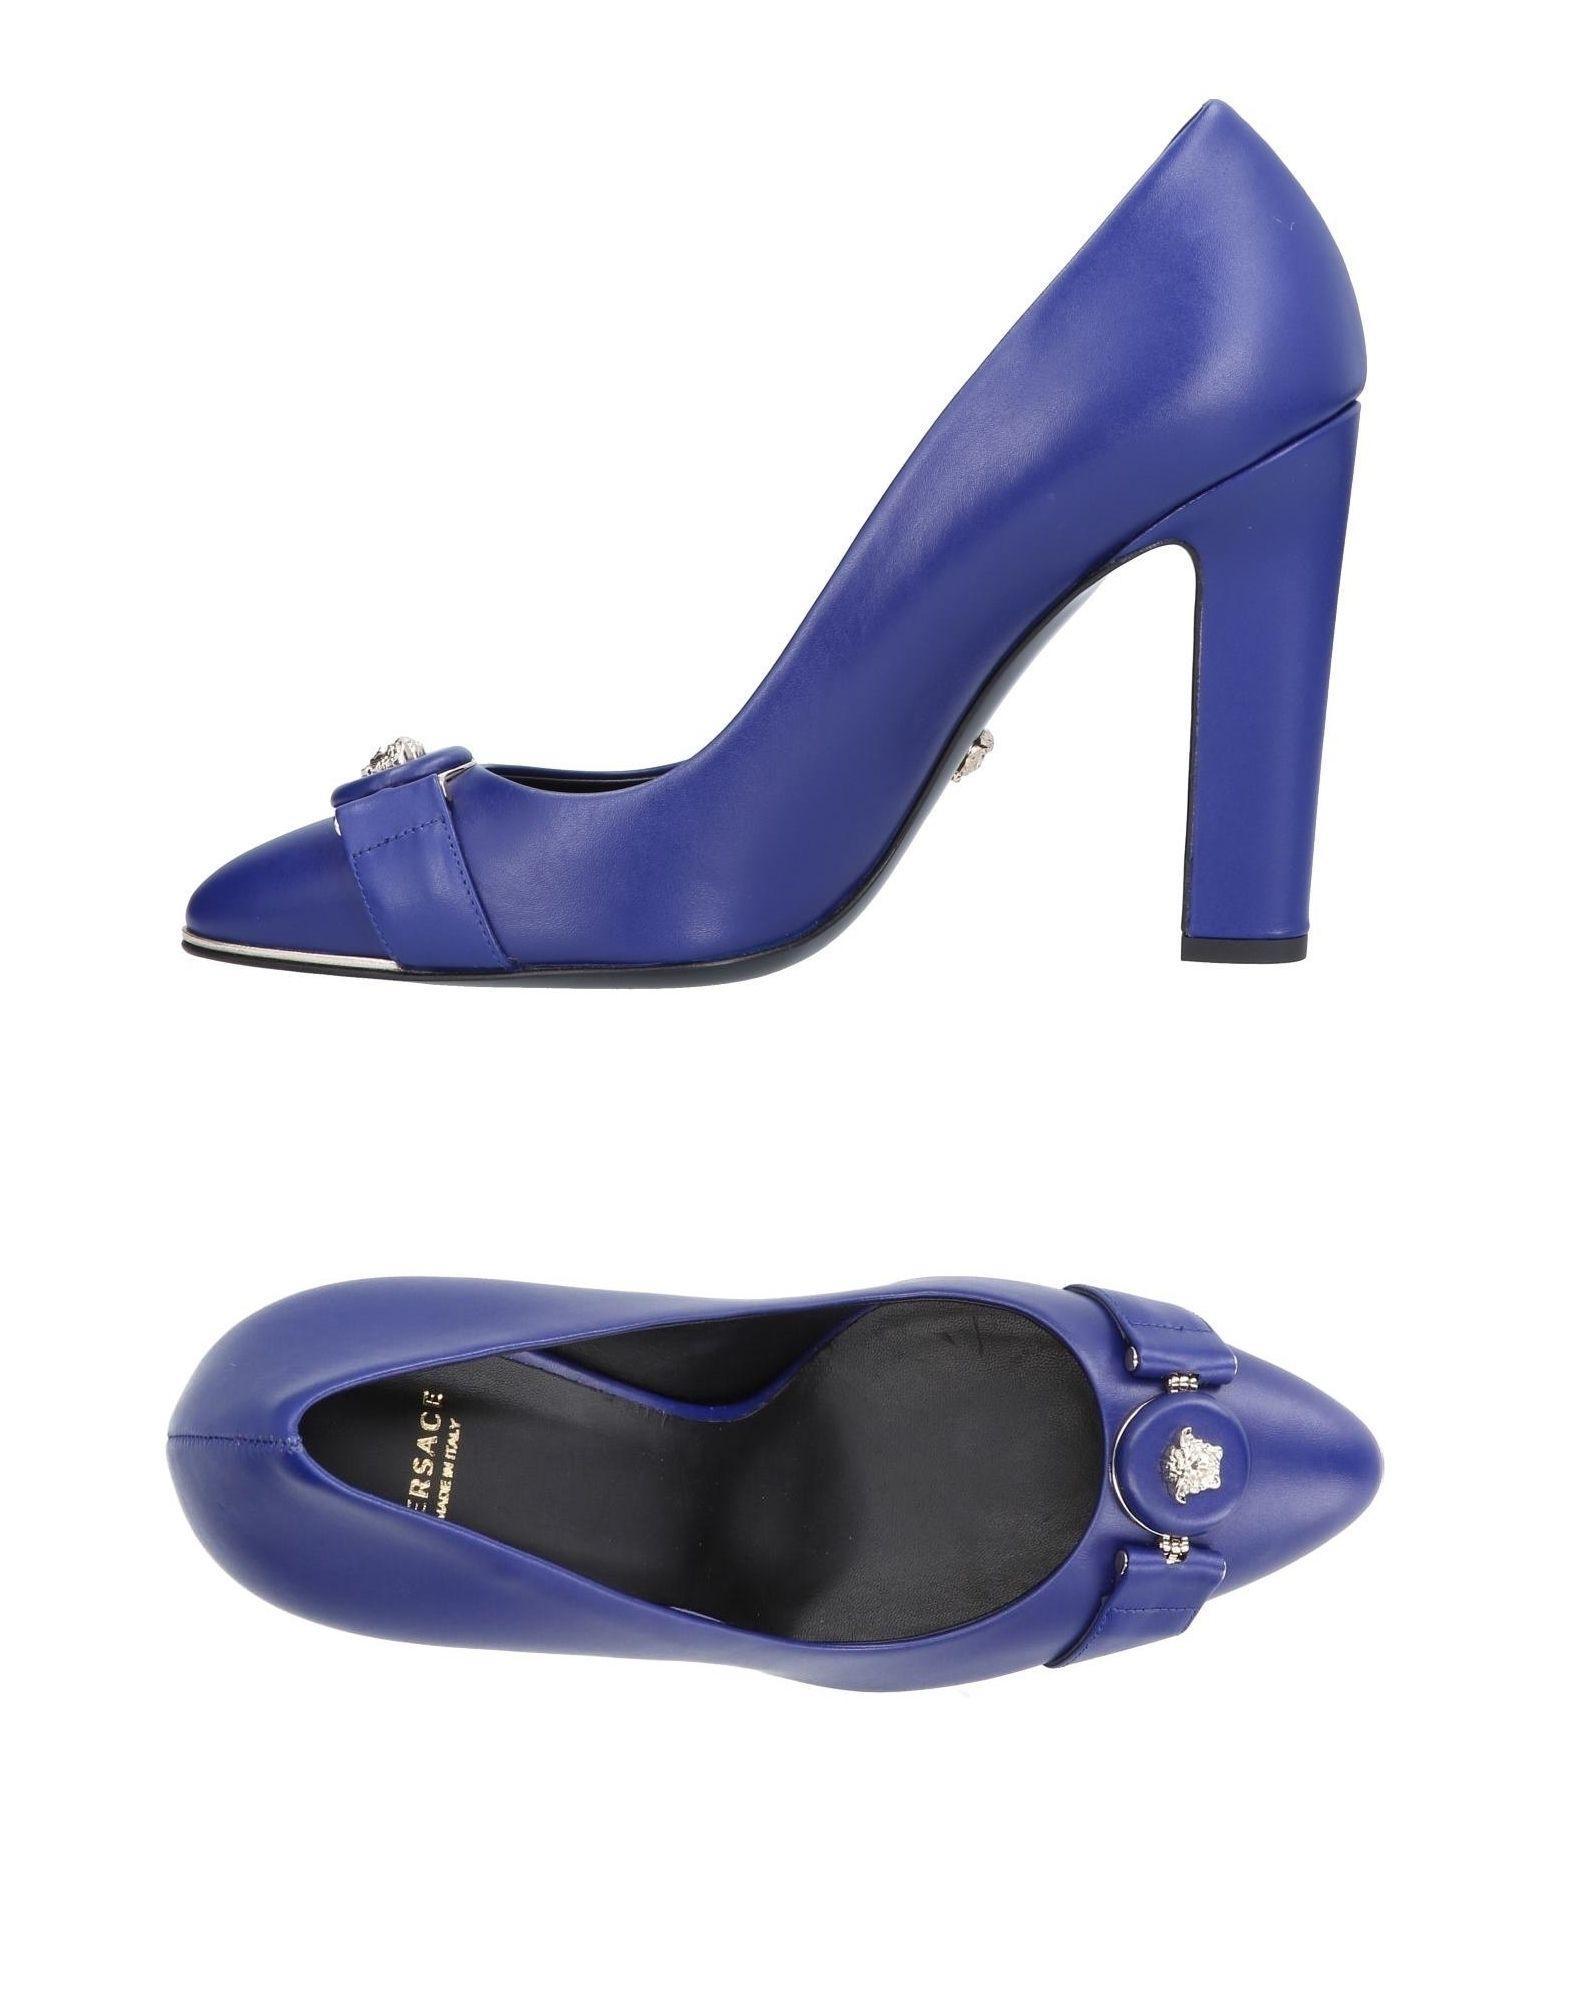 Versace Pump In Blue